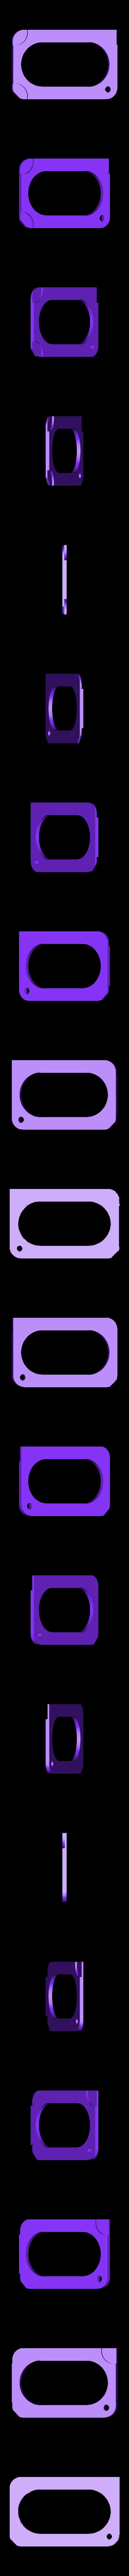 KEYSTORAGE2.5mm.stl Download free STL file Credit Card Key Case • Template to 3D print, Gophy